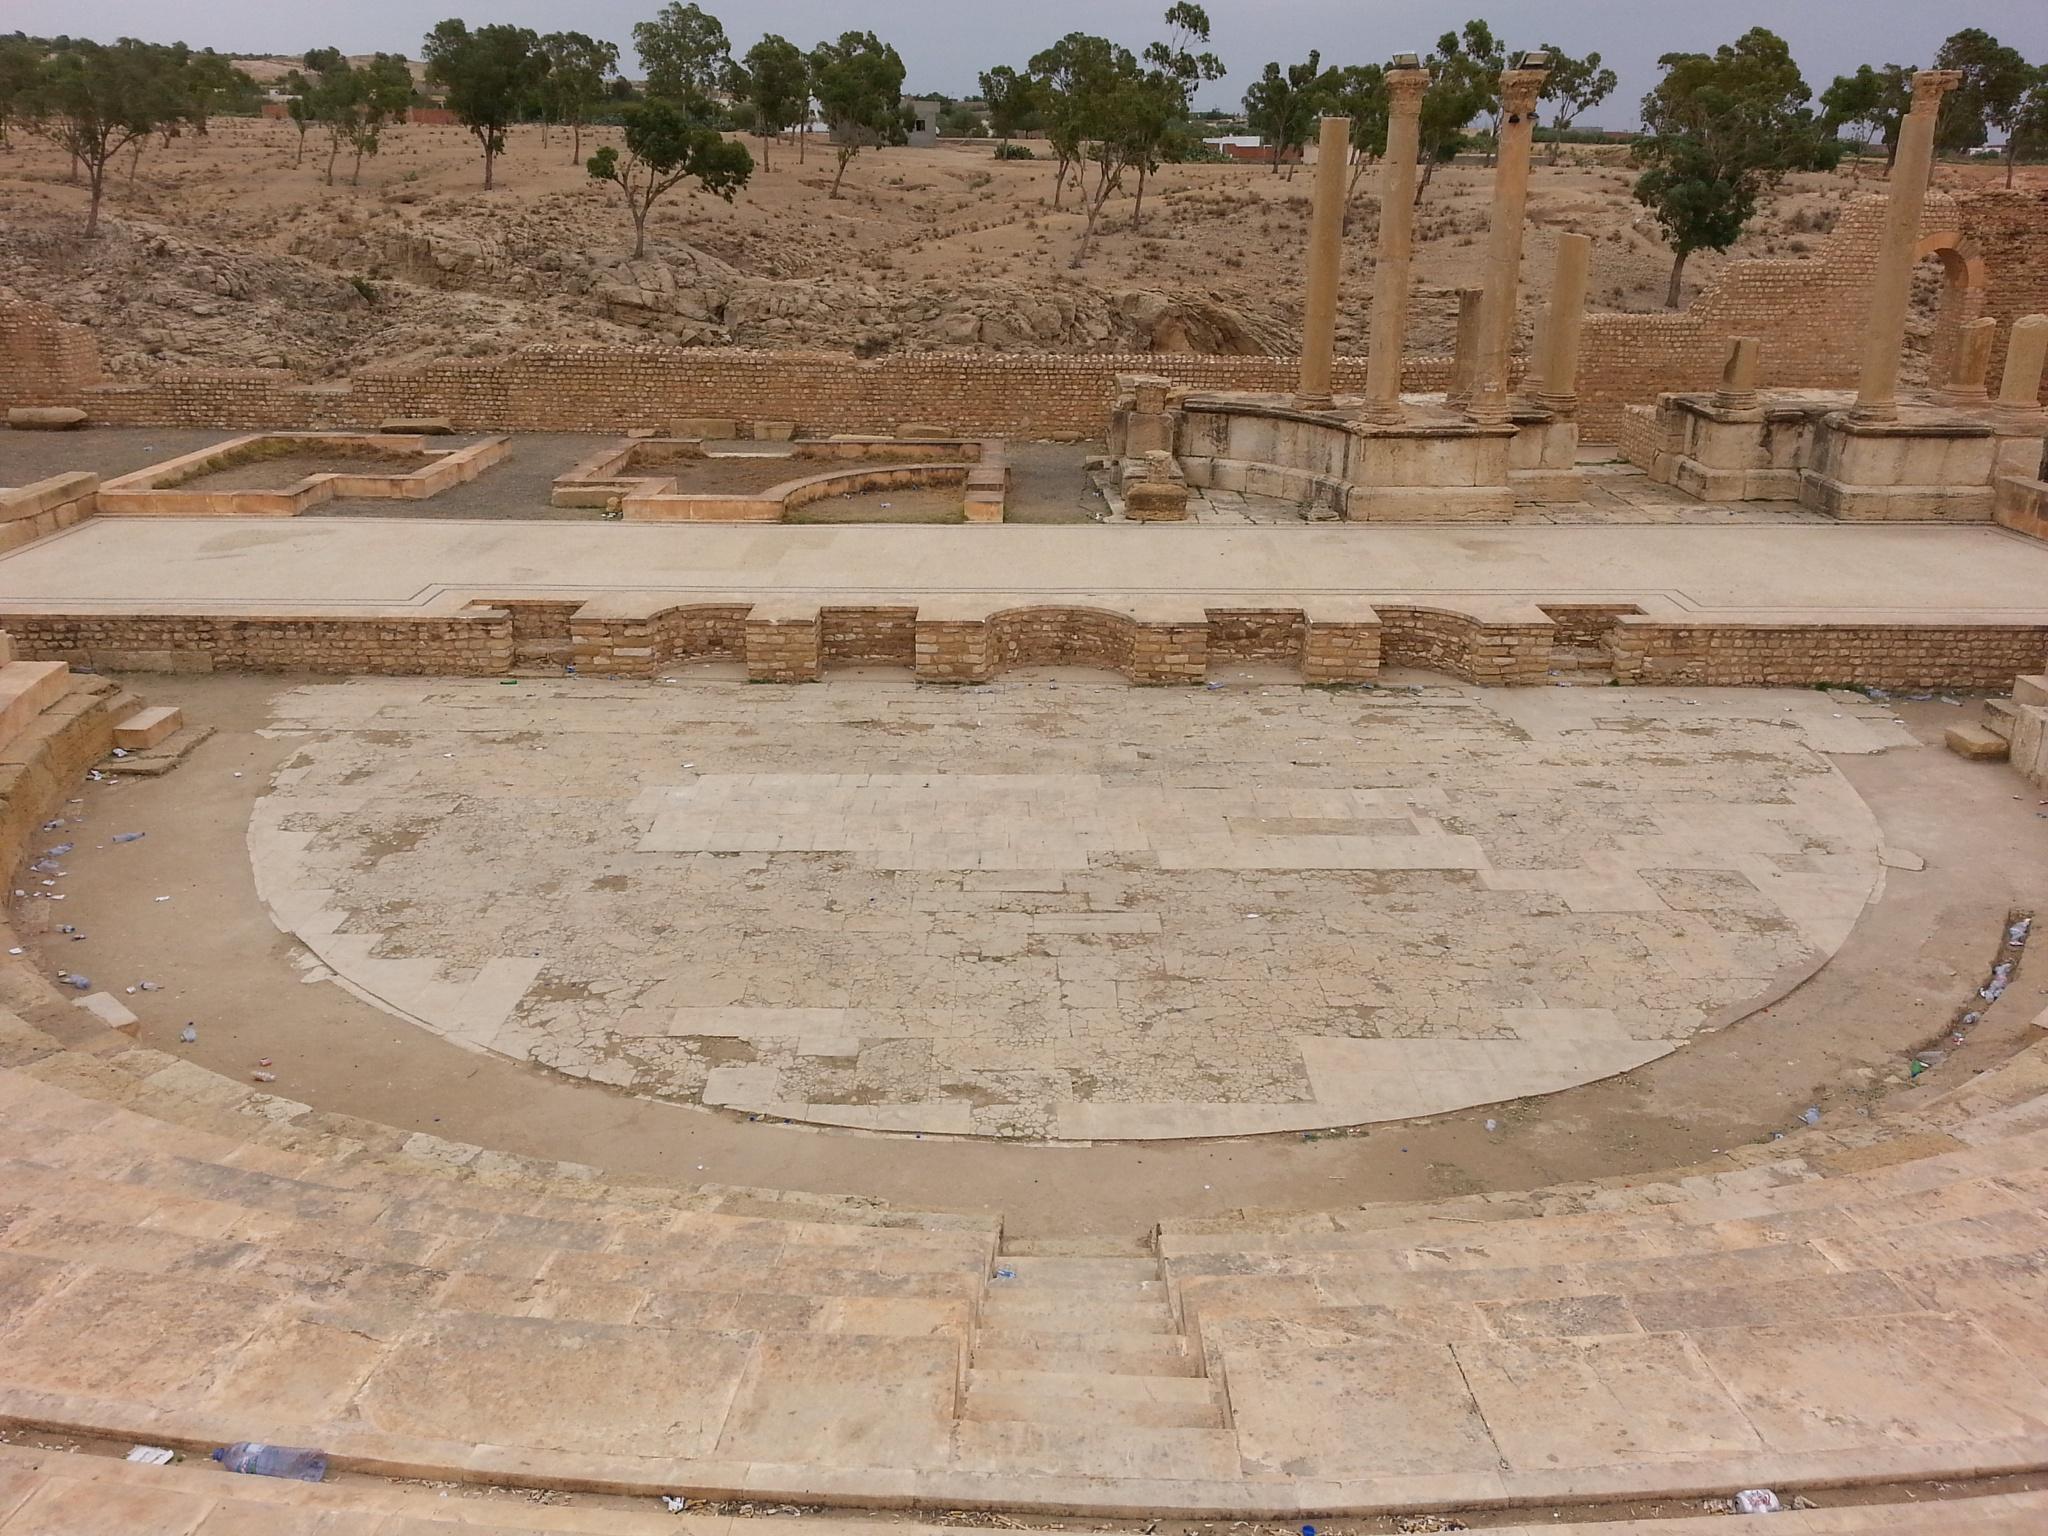 Amphitheater by Zahirul Talukdar